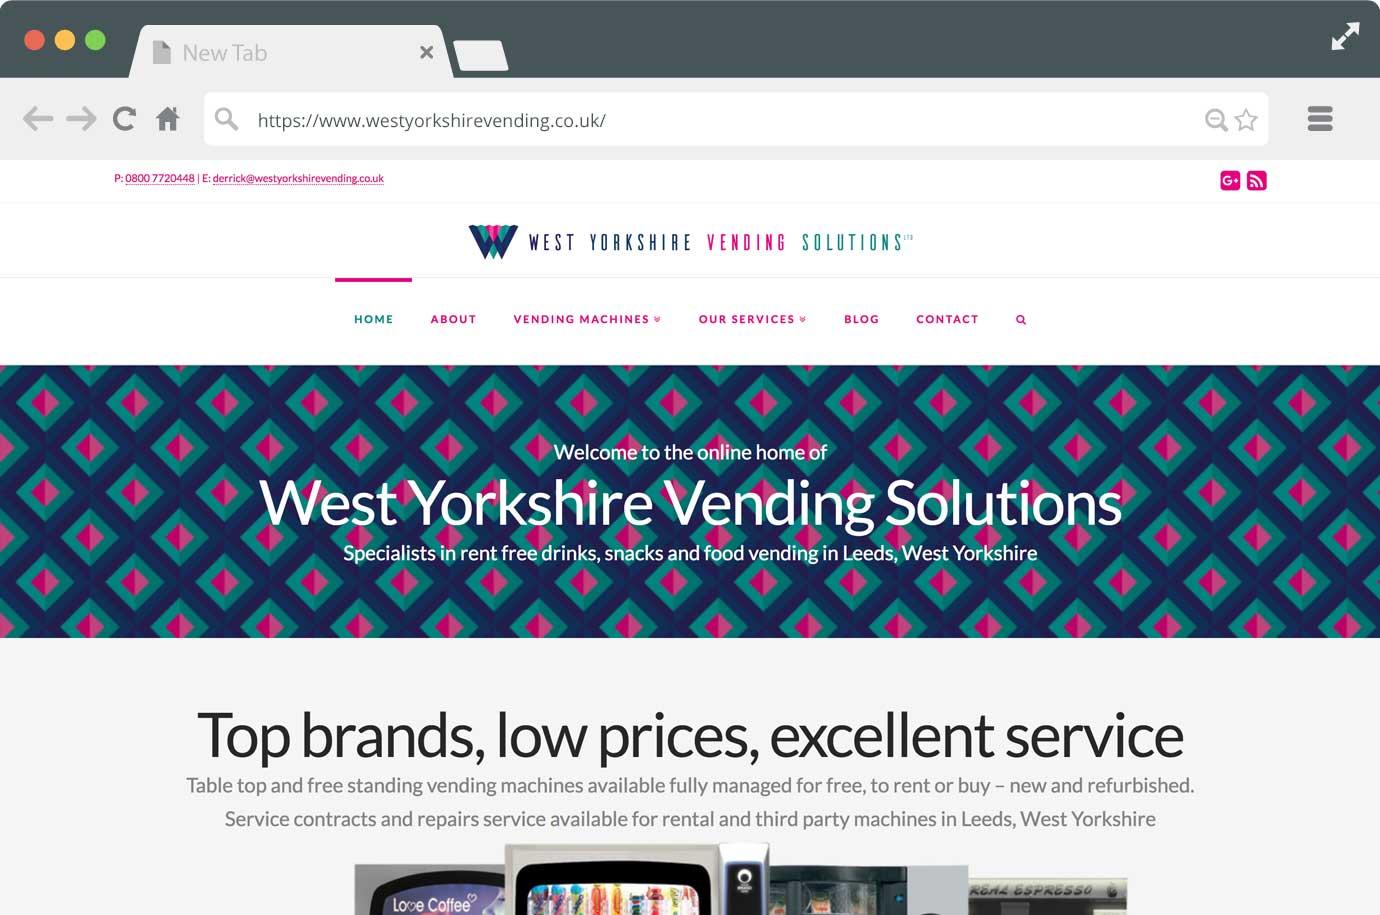 West Yorkshire Vending Solutions website